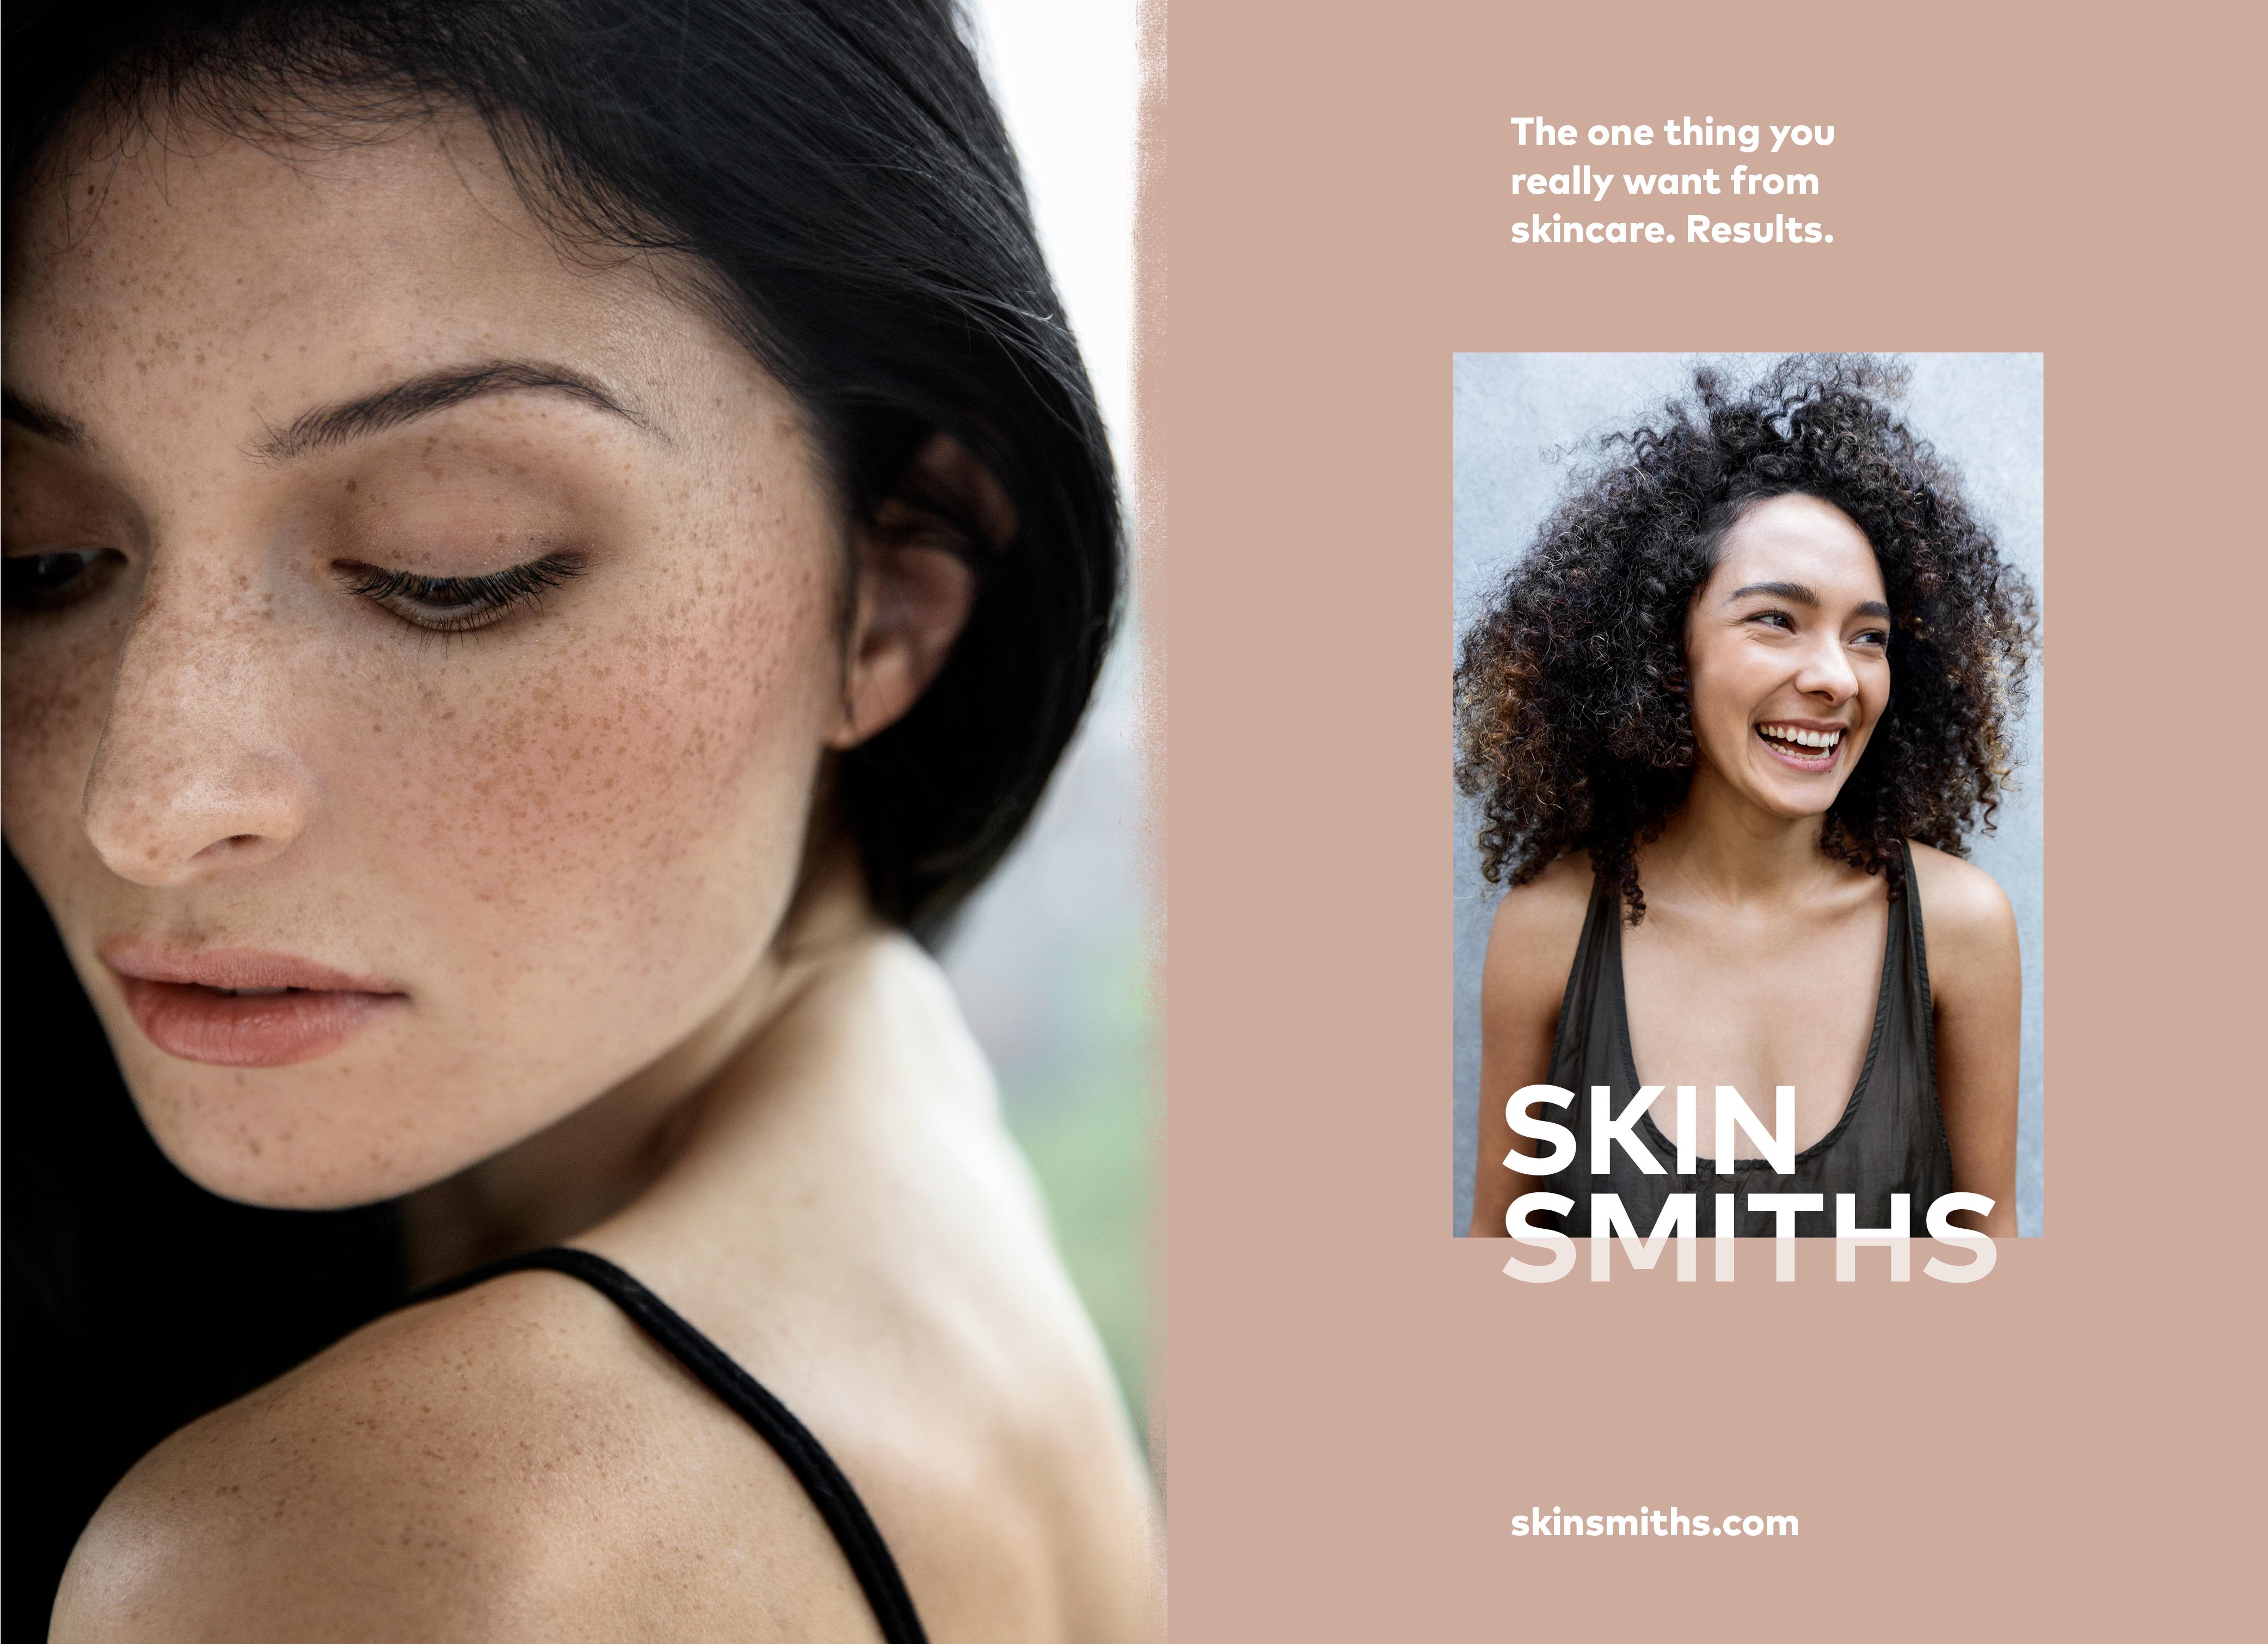 https://tanamitchell.com/wp-content/uploads/2018/07/SkinSmiths2018-2000x1450px8.jpg